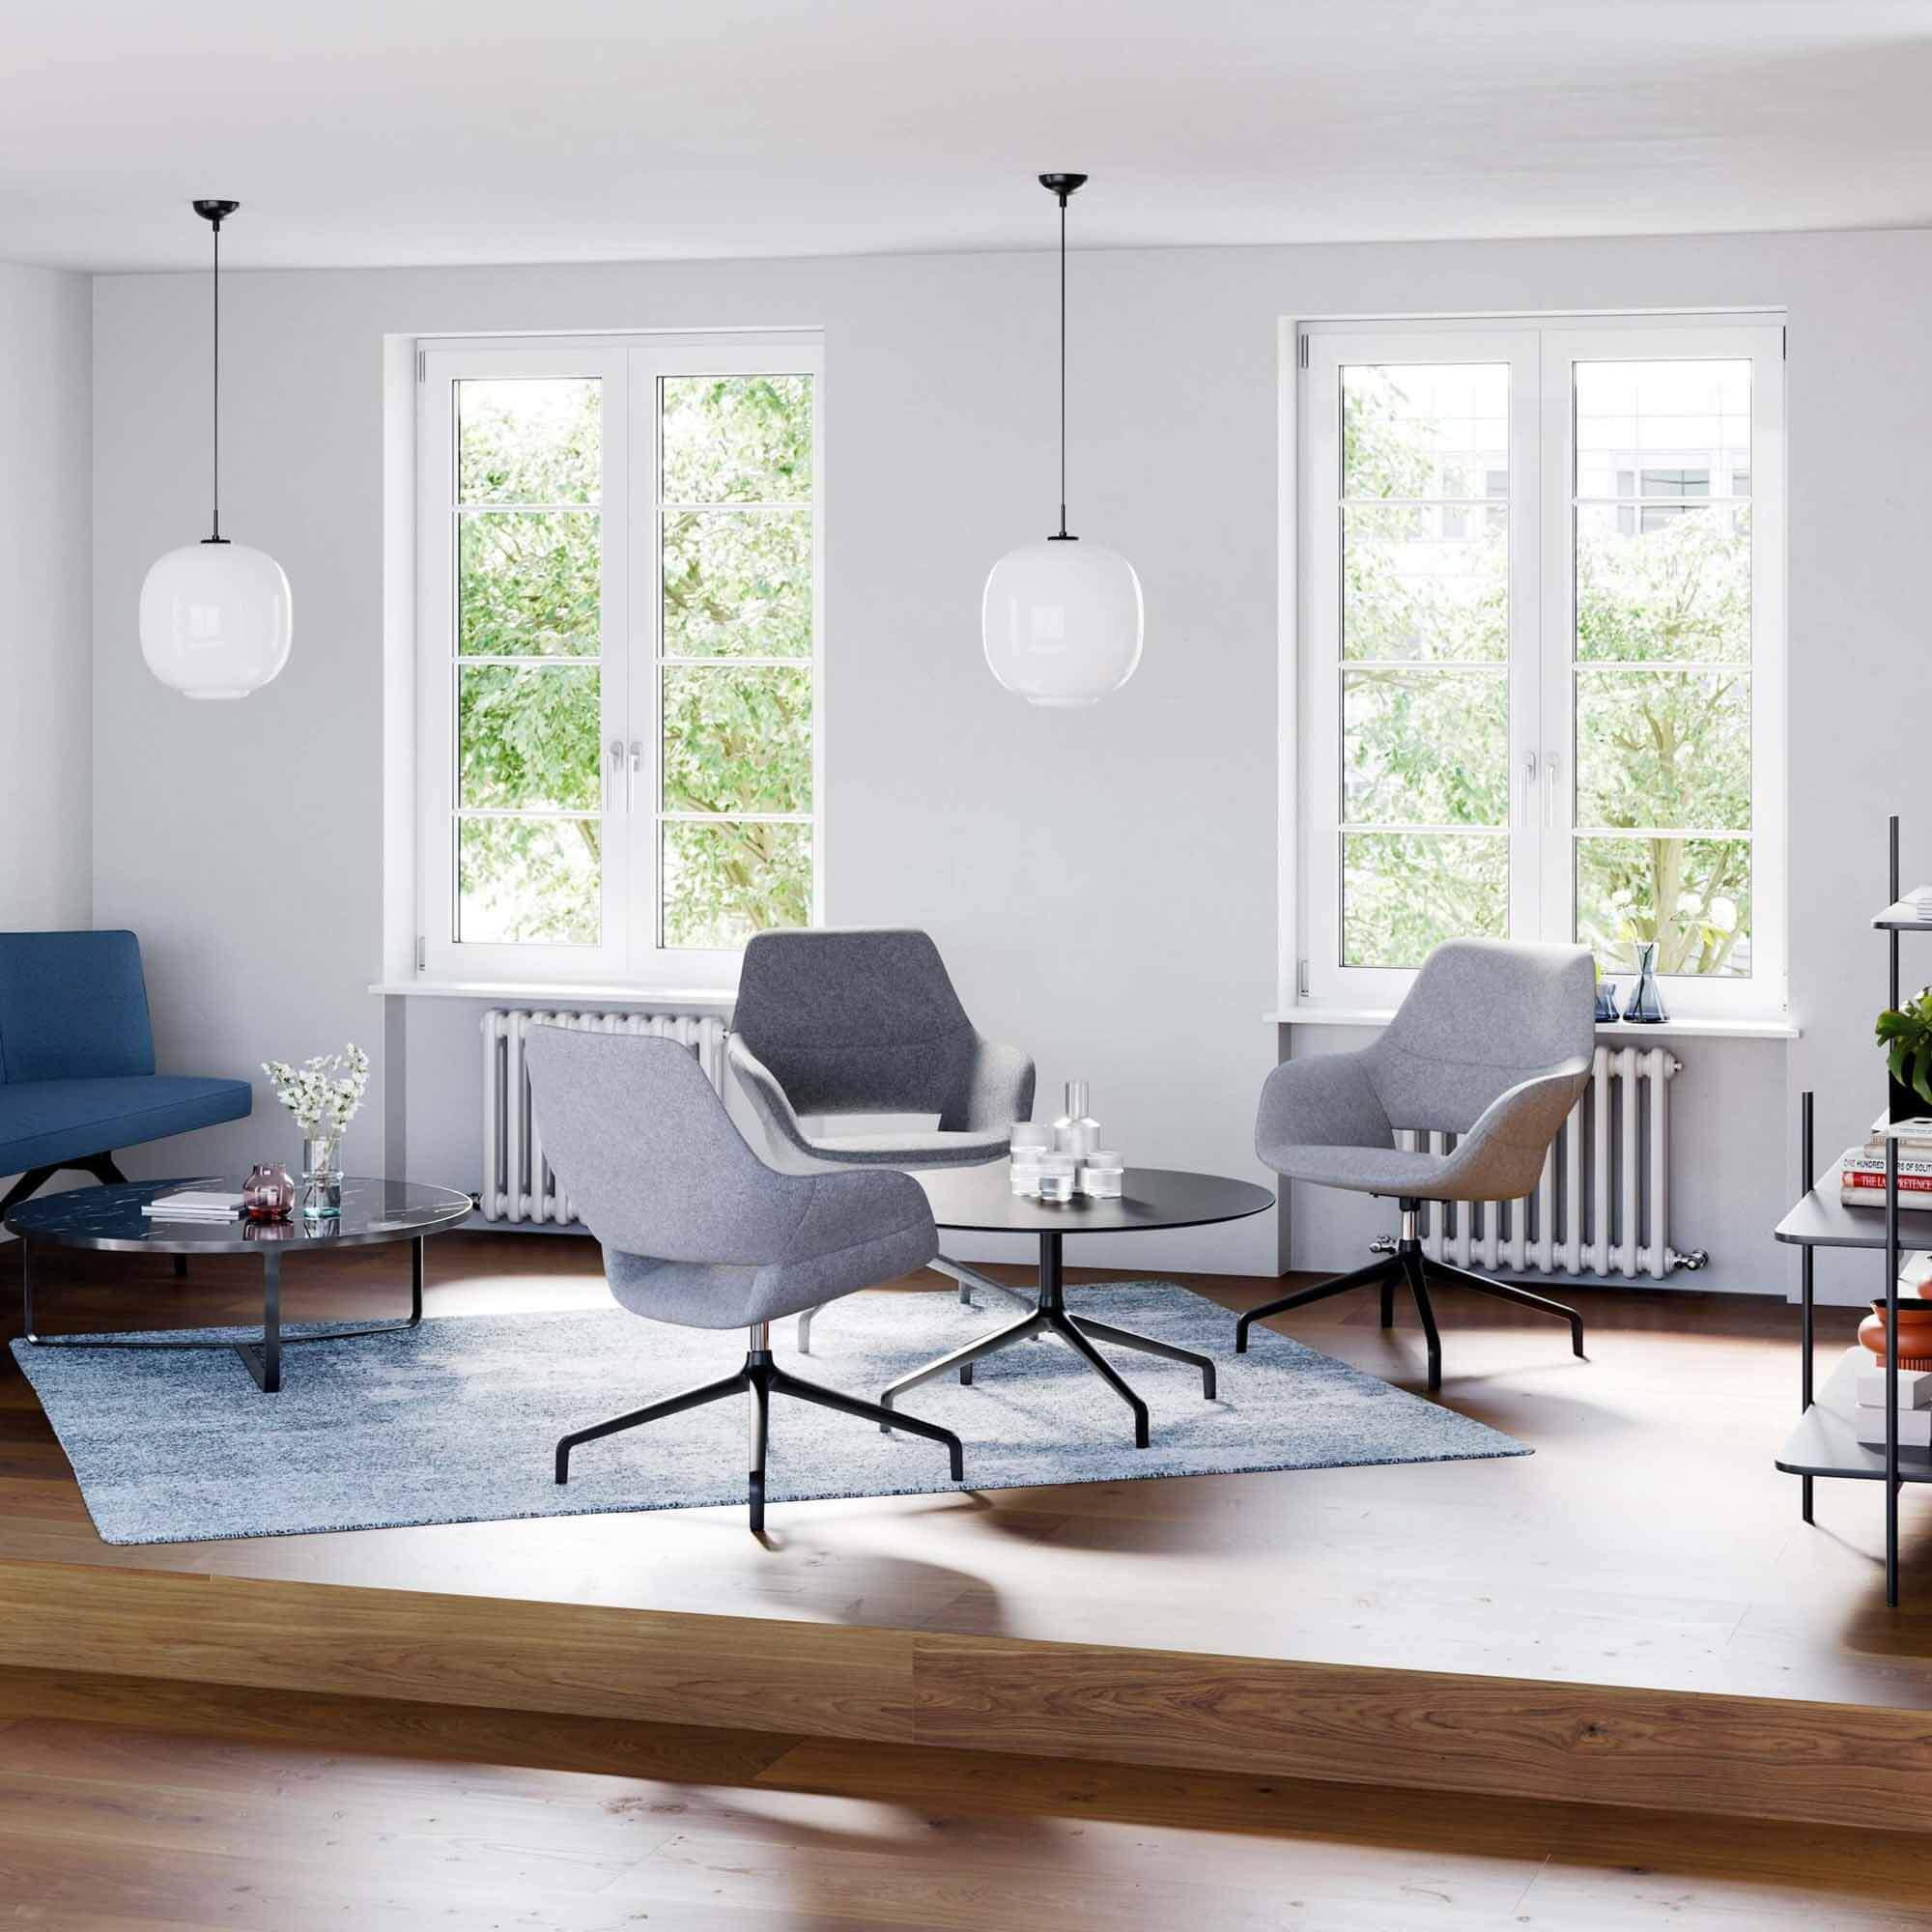 Кресло Occo, разработанное Jehs + Laub для Wilkhahn